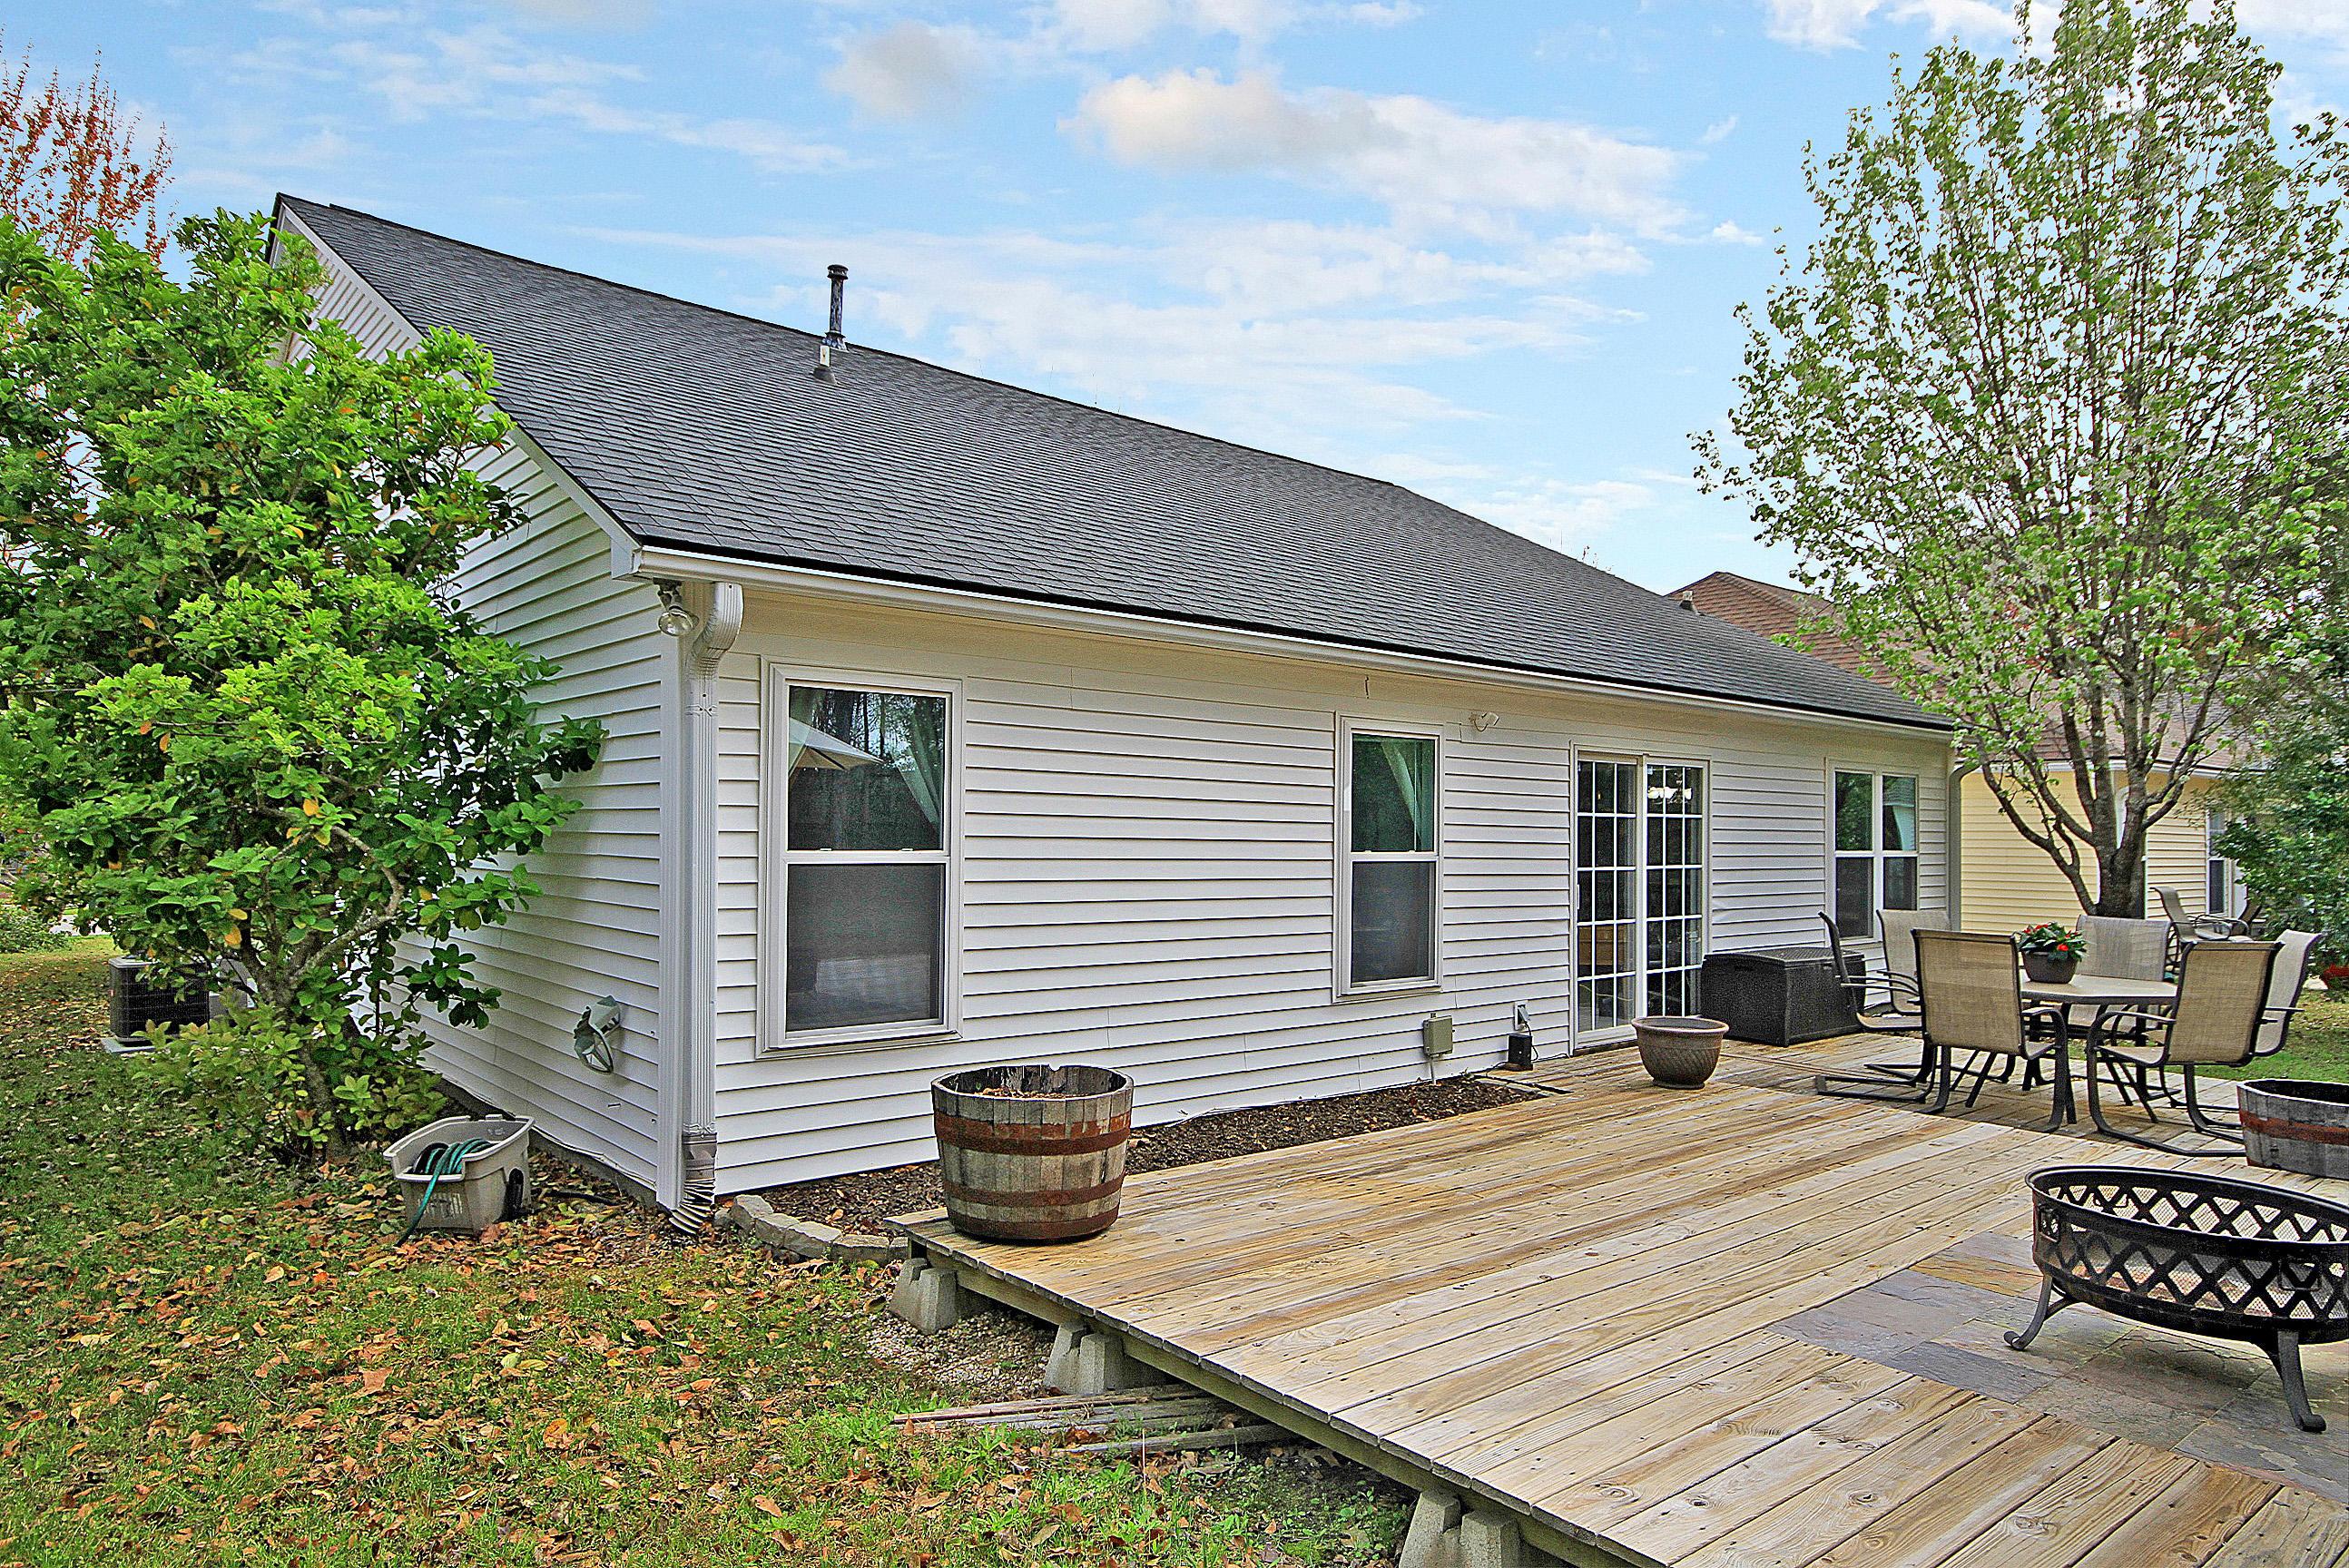 Park West Homes For Sale - 1460 Wellesley, Mount Pleasant, SC - 18